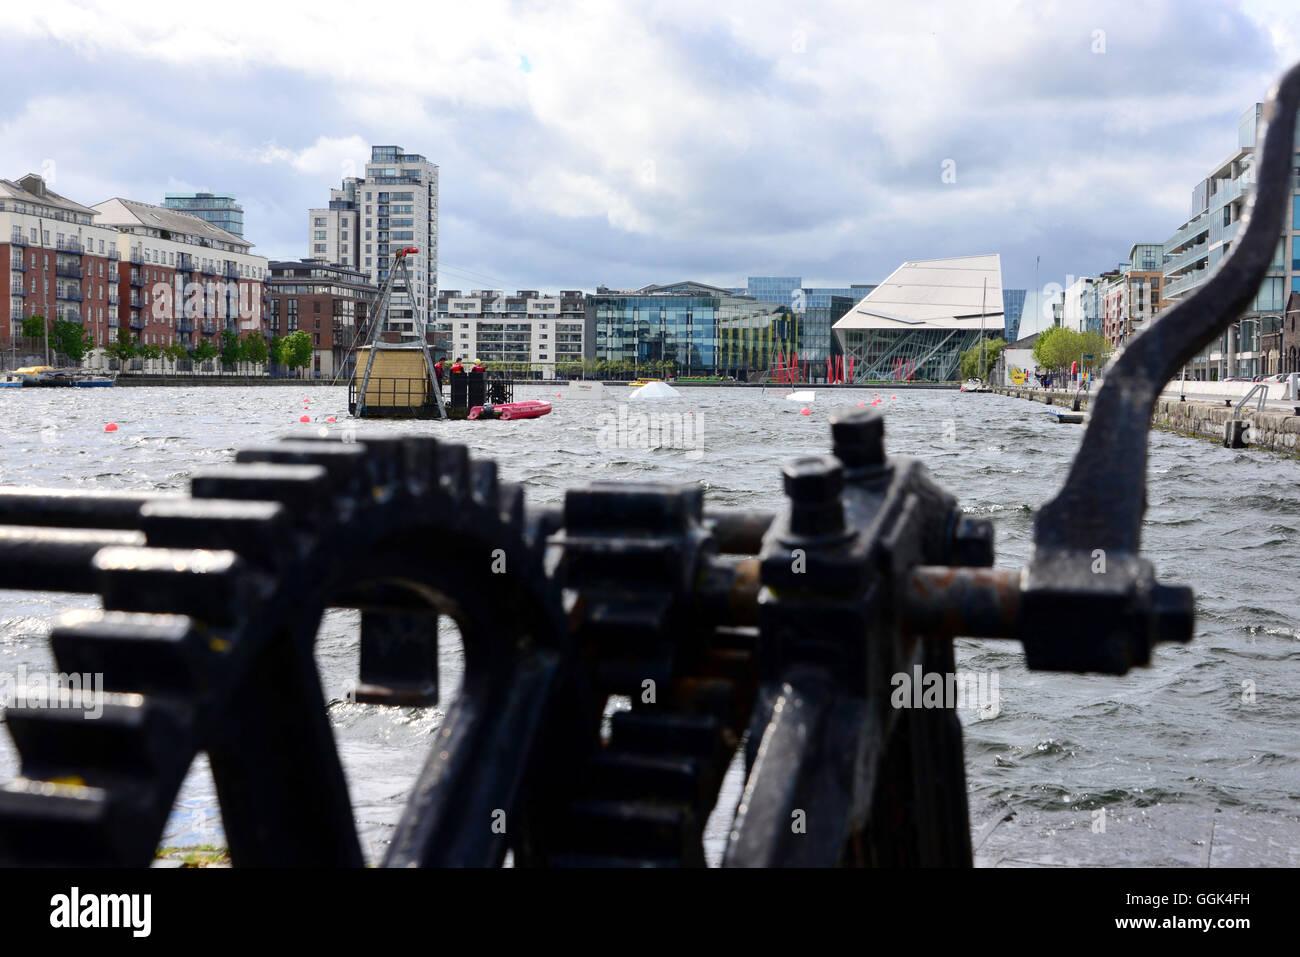 Grand Canal Dock, Docklands, Dublin, Ireland - Stock Image